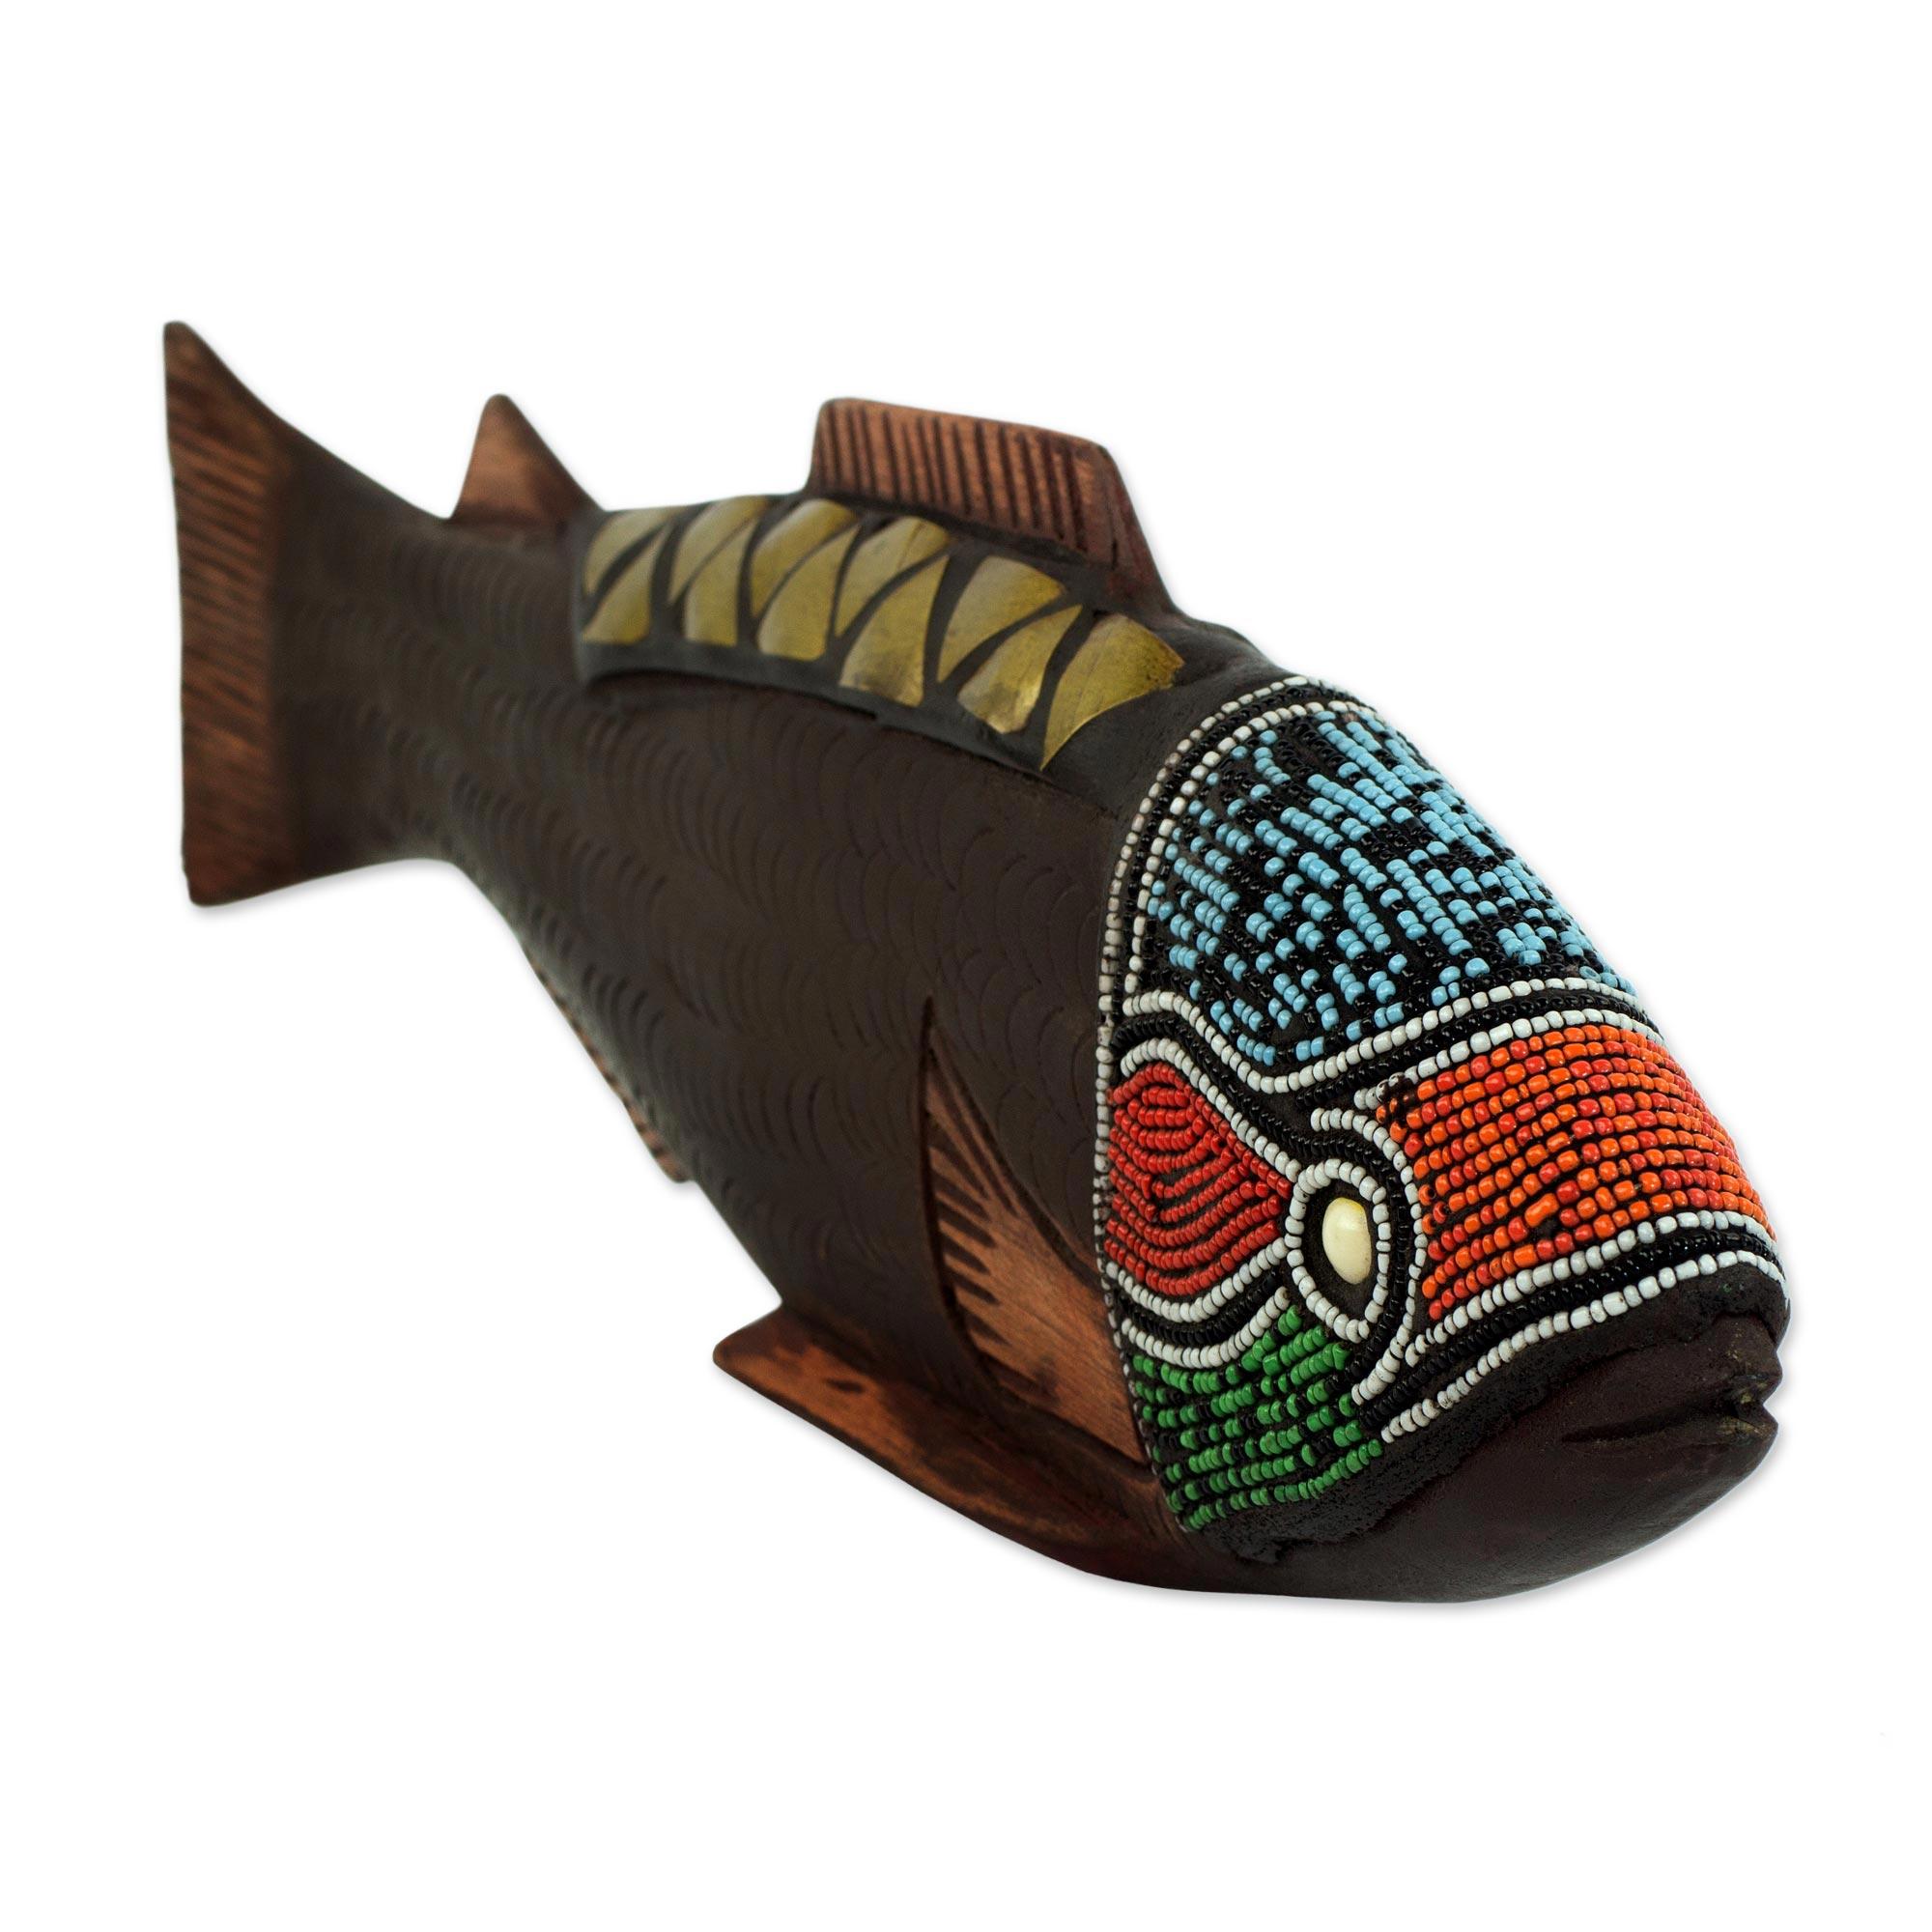 Fish Sculpture by Abdul Aziz Mohammadu